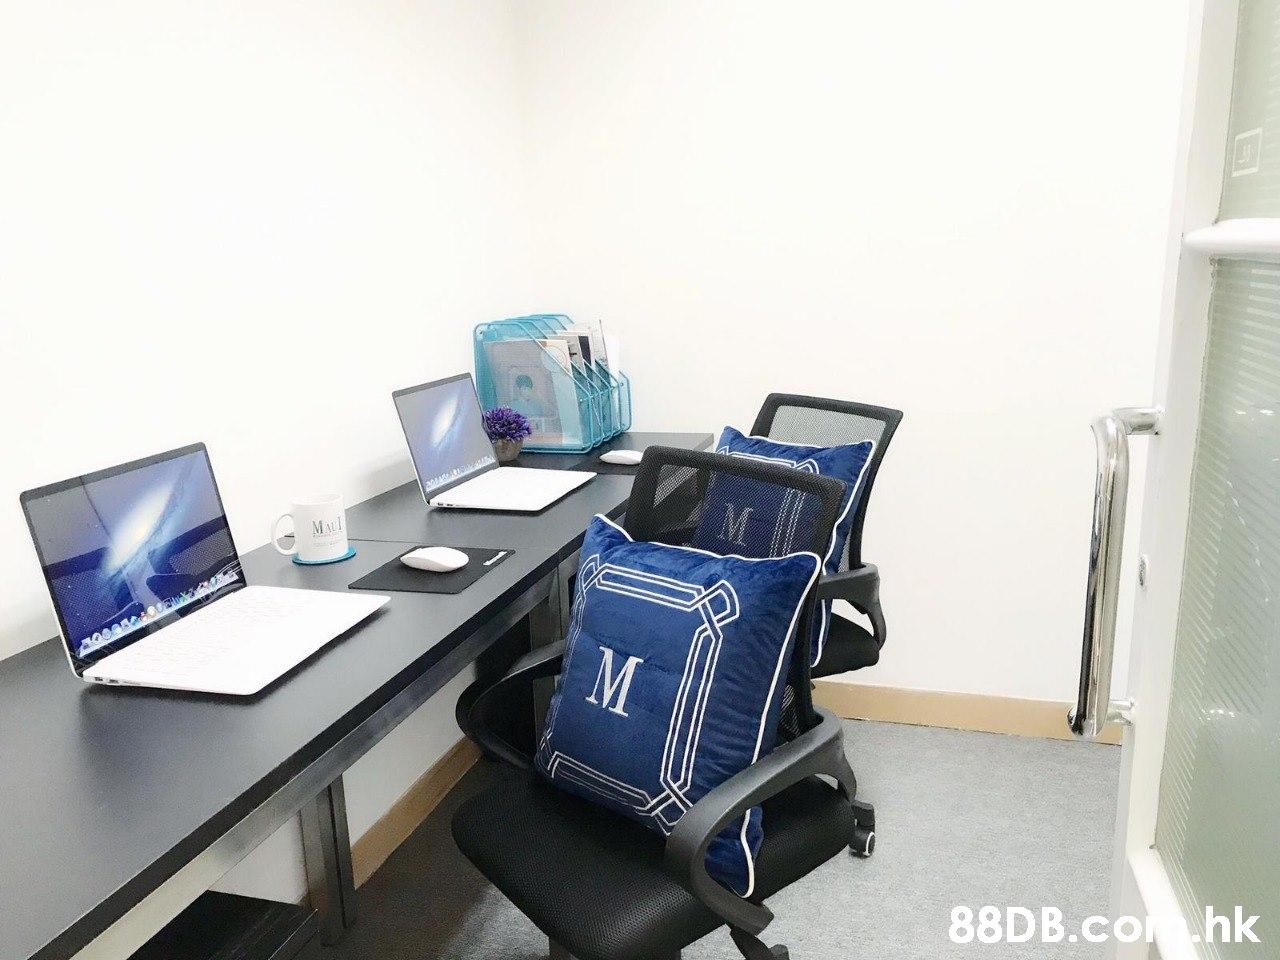 MAC M 88DB.co .hk  Office,Product,Computer desk,Room,Desk